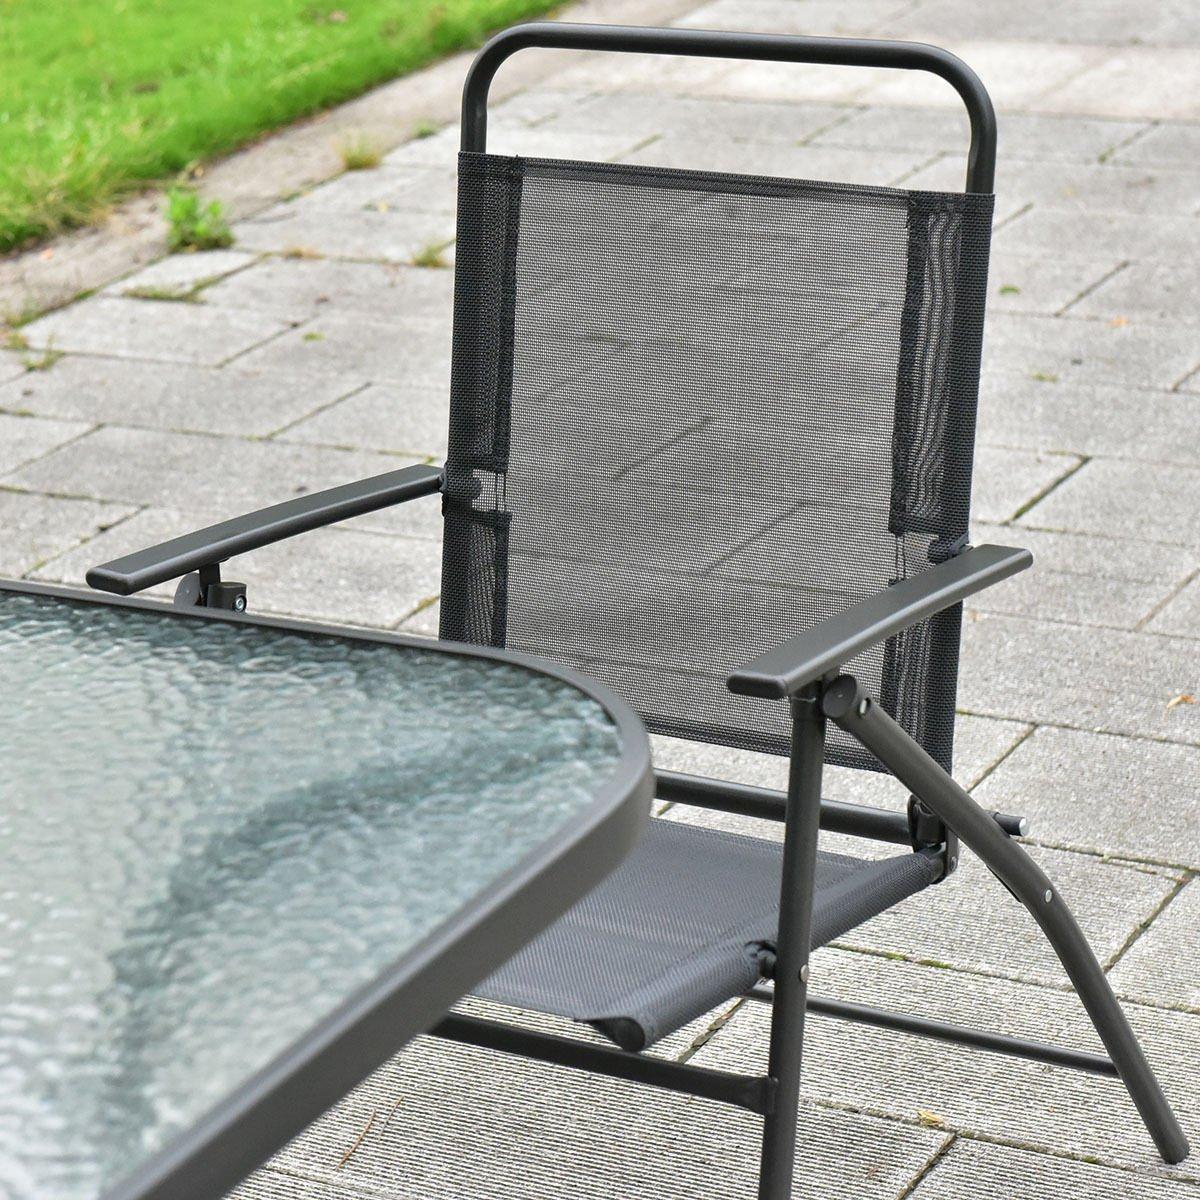 amazoncom giantex 8pcs patio garden set furniture 6 folding chairs table with umbrella gray new garden outdoor